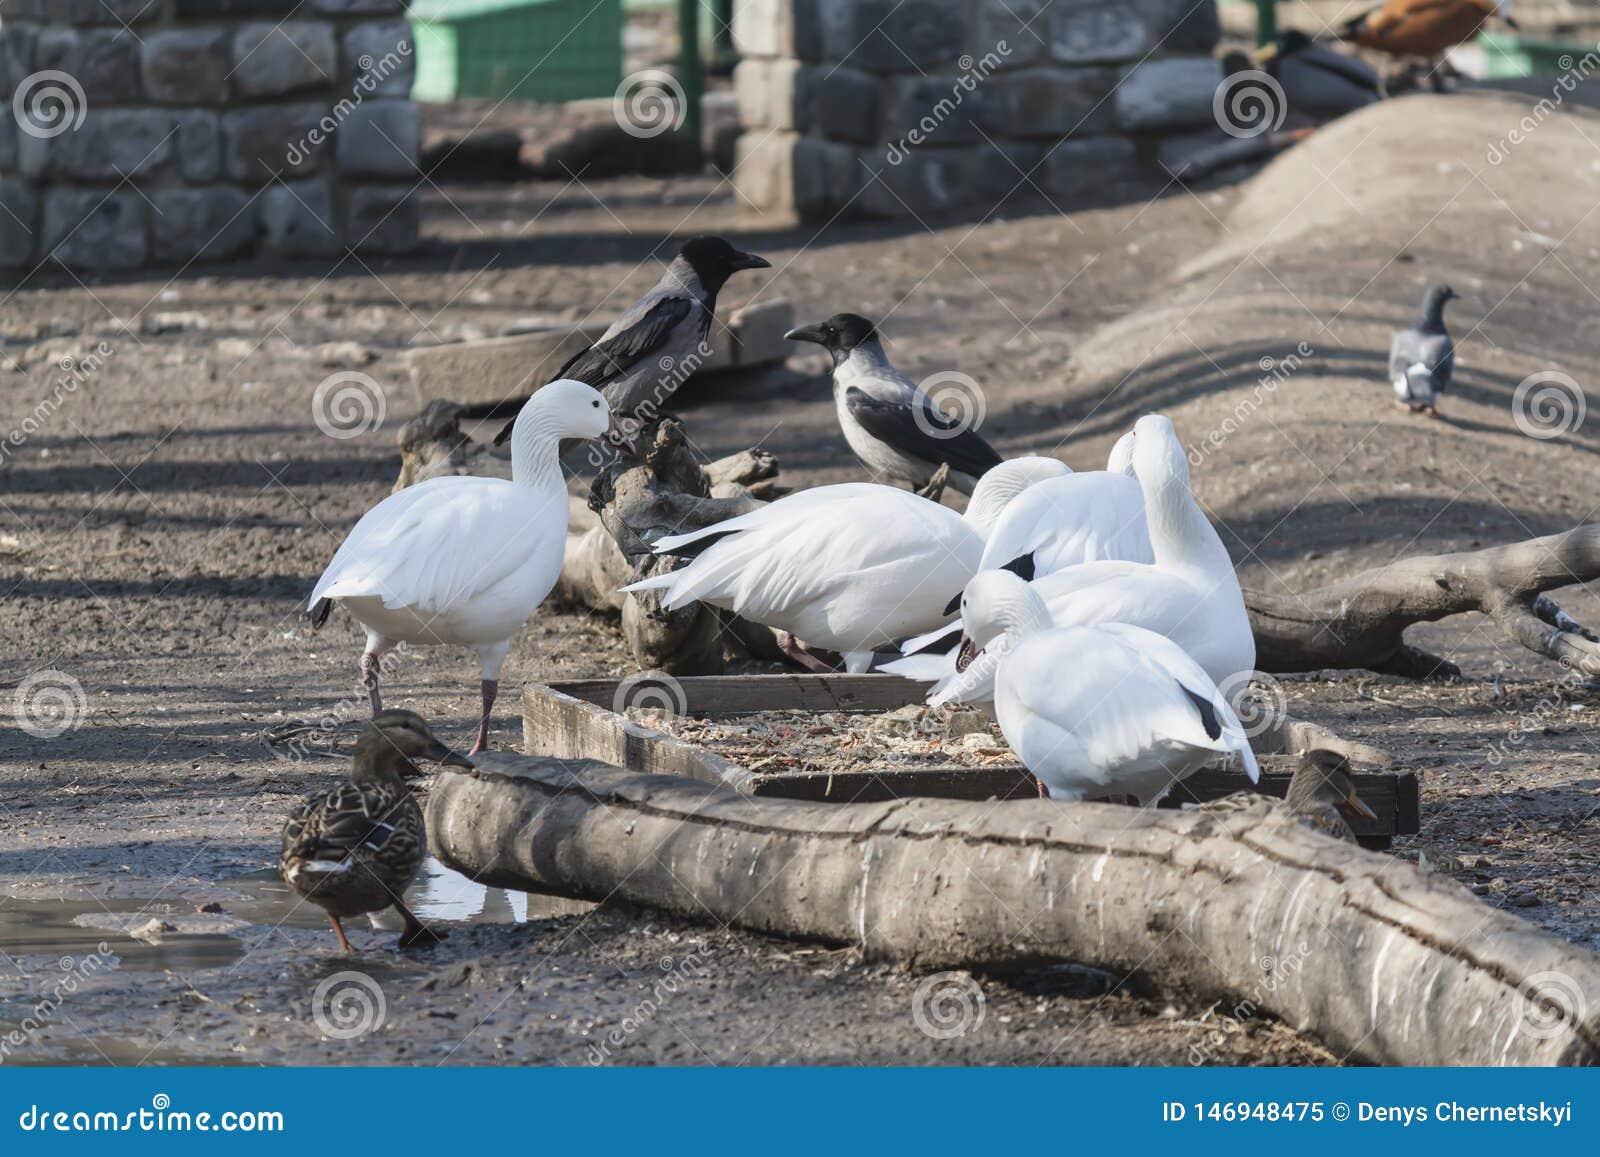 A flock of wild birds